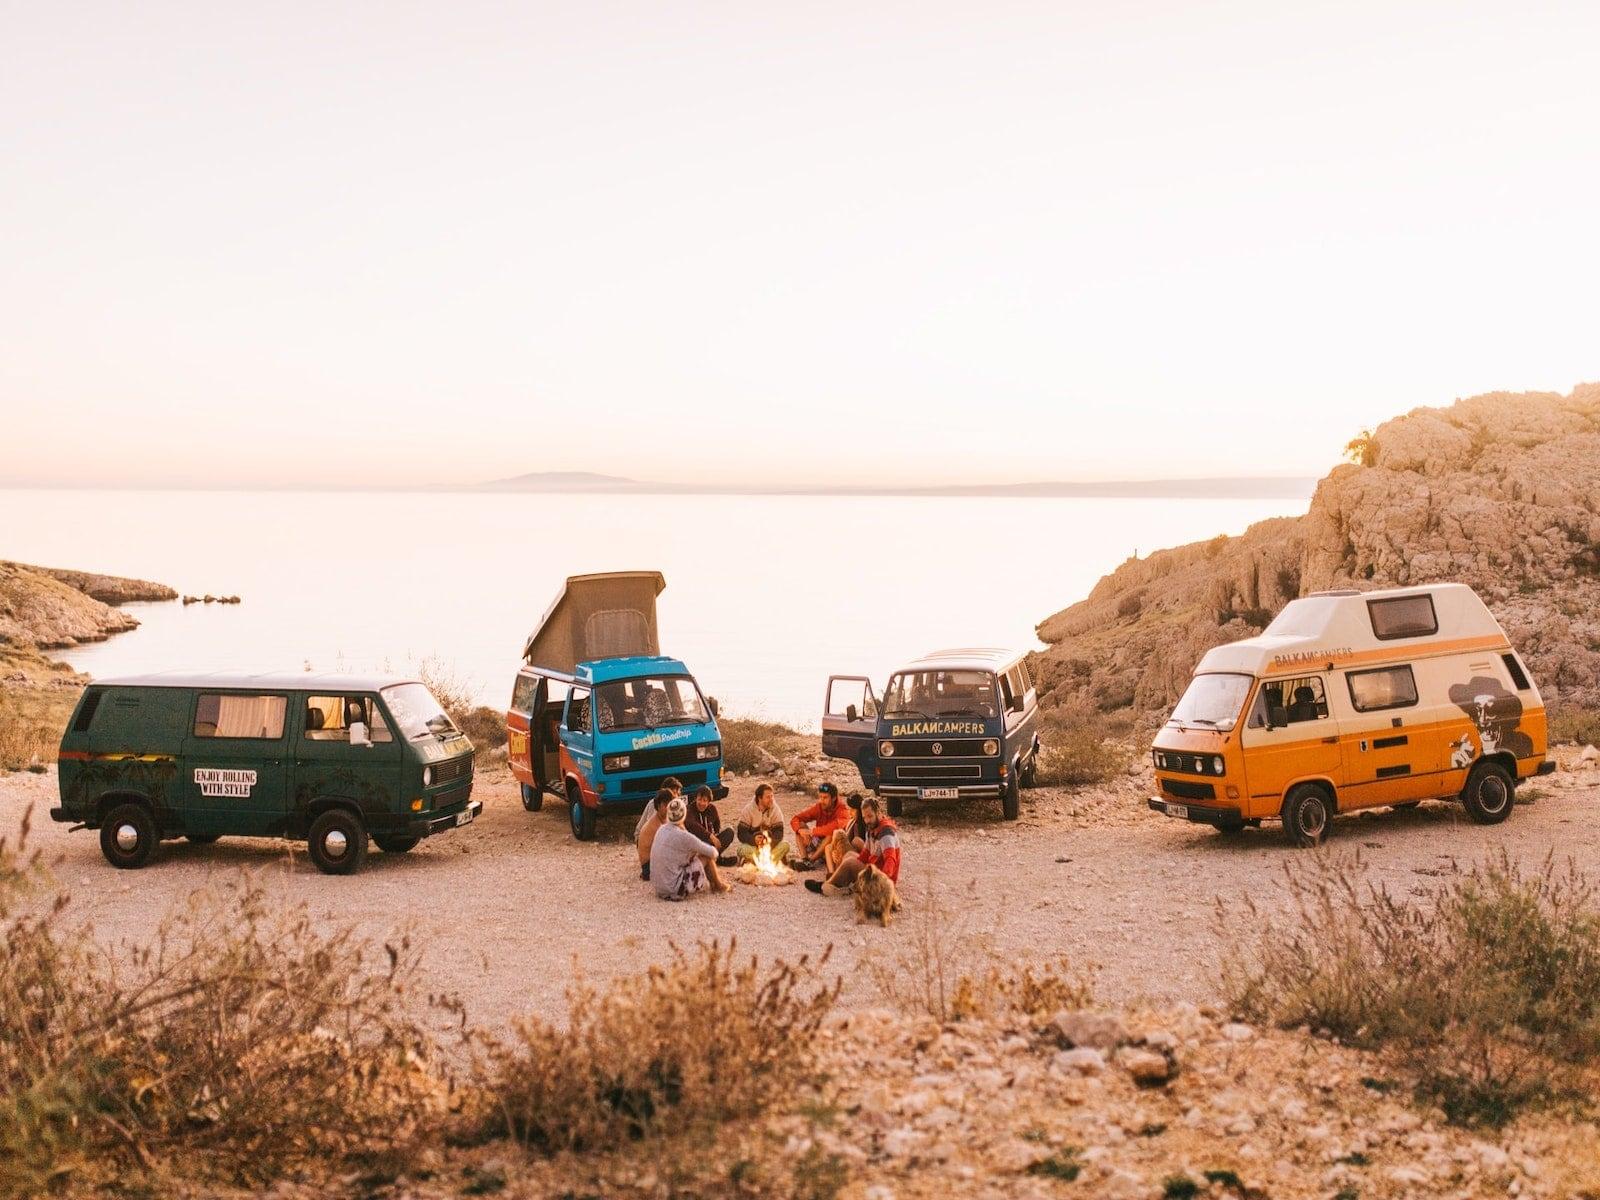 Urlaub mit dem Wohnmobil 2020 2021